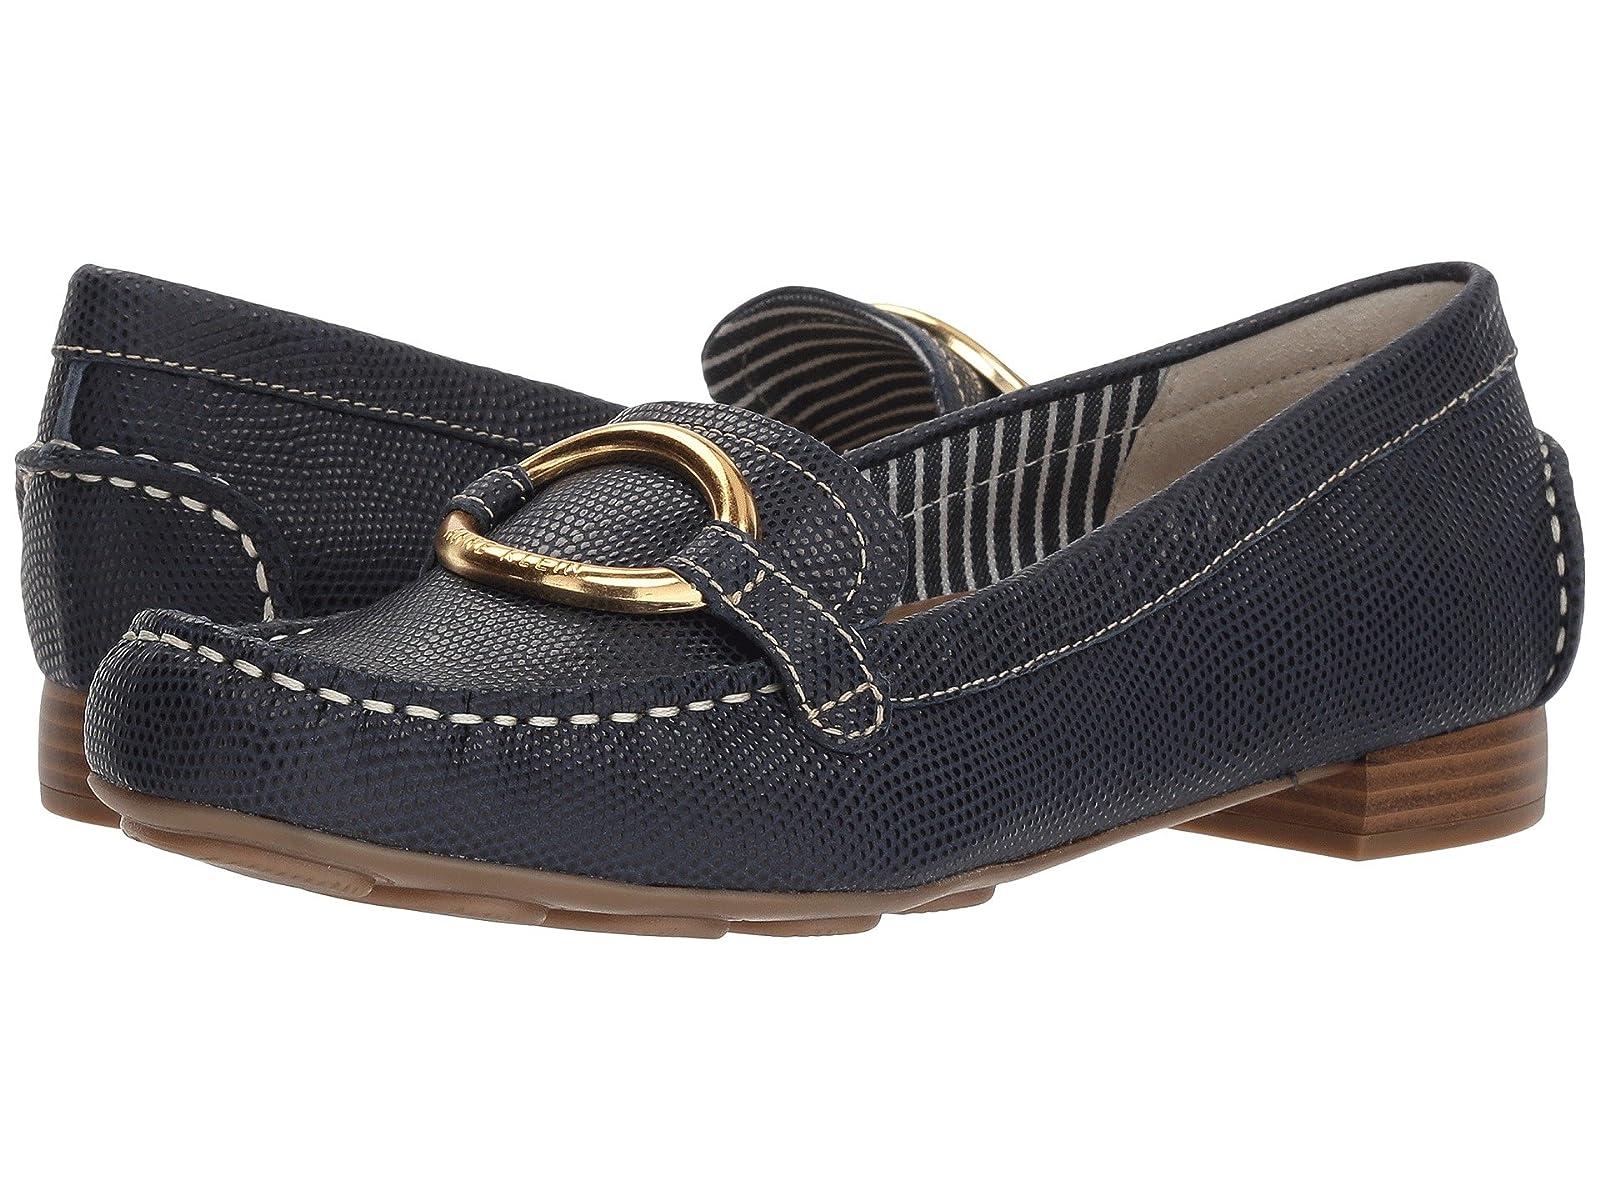 Anne Klein HarmonieAtmospheric grades have affordable shoes